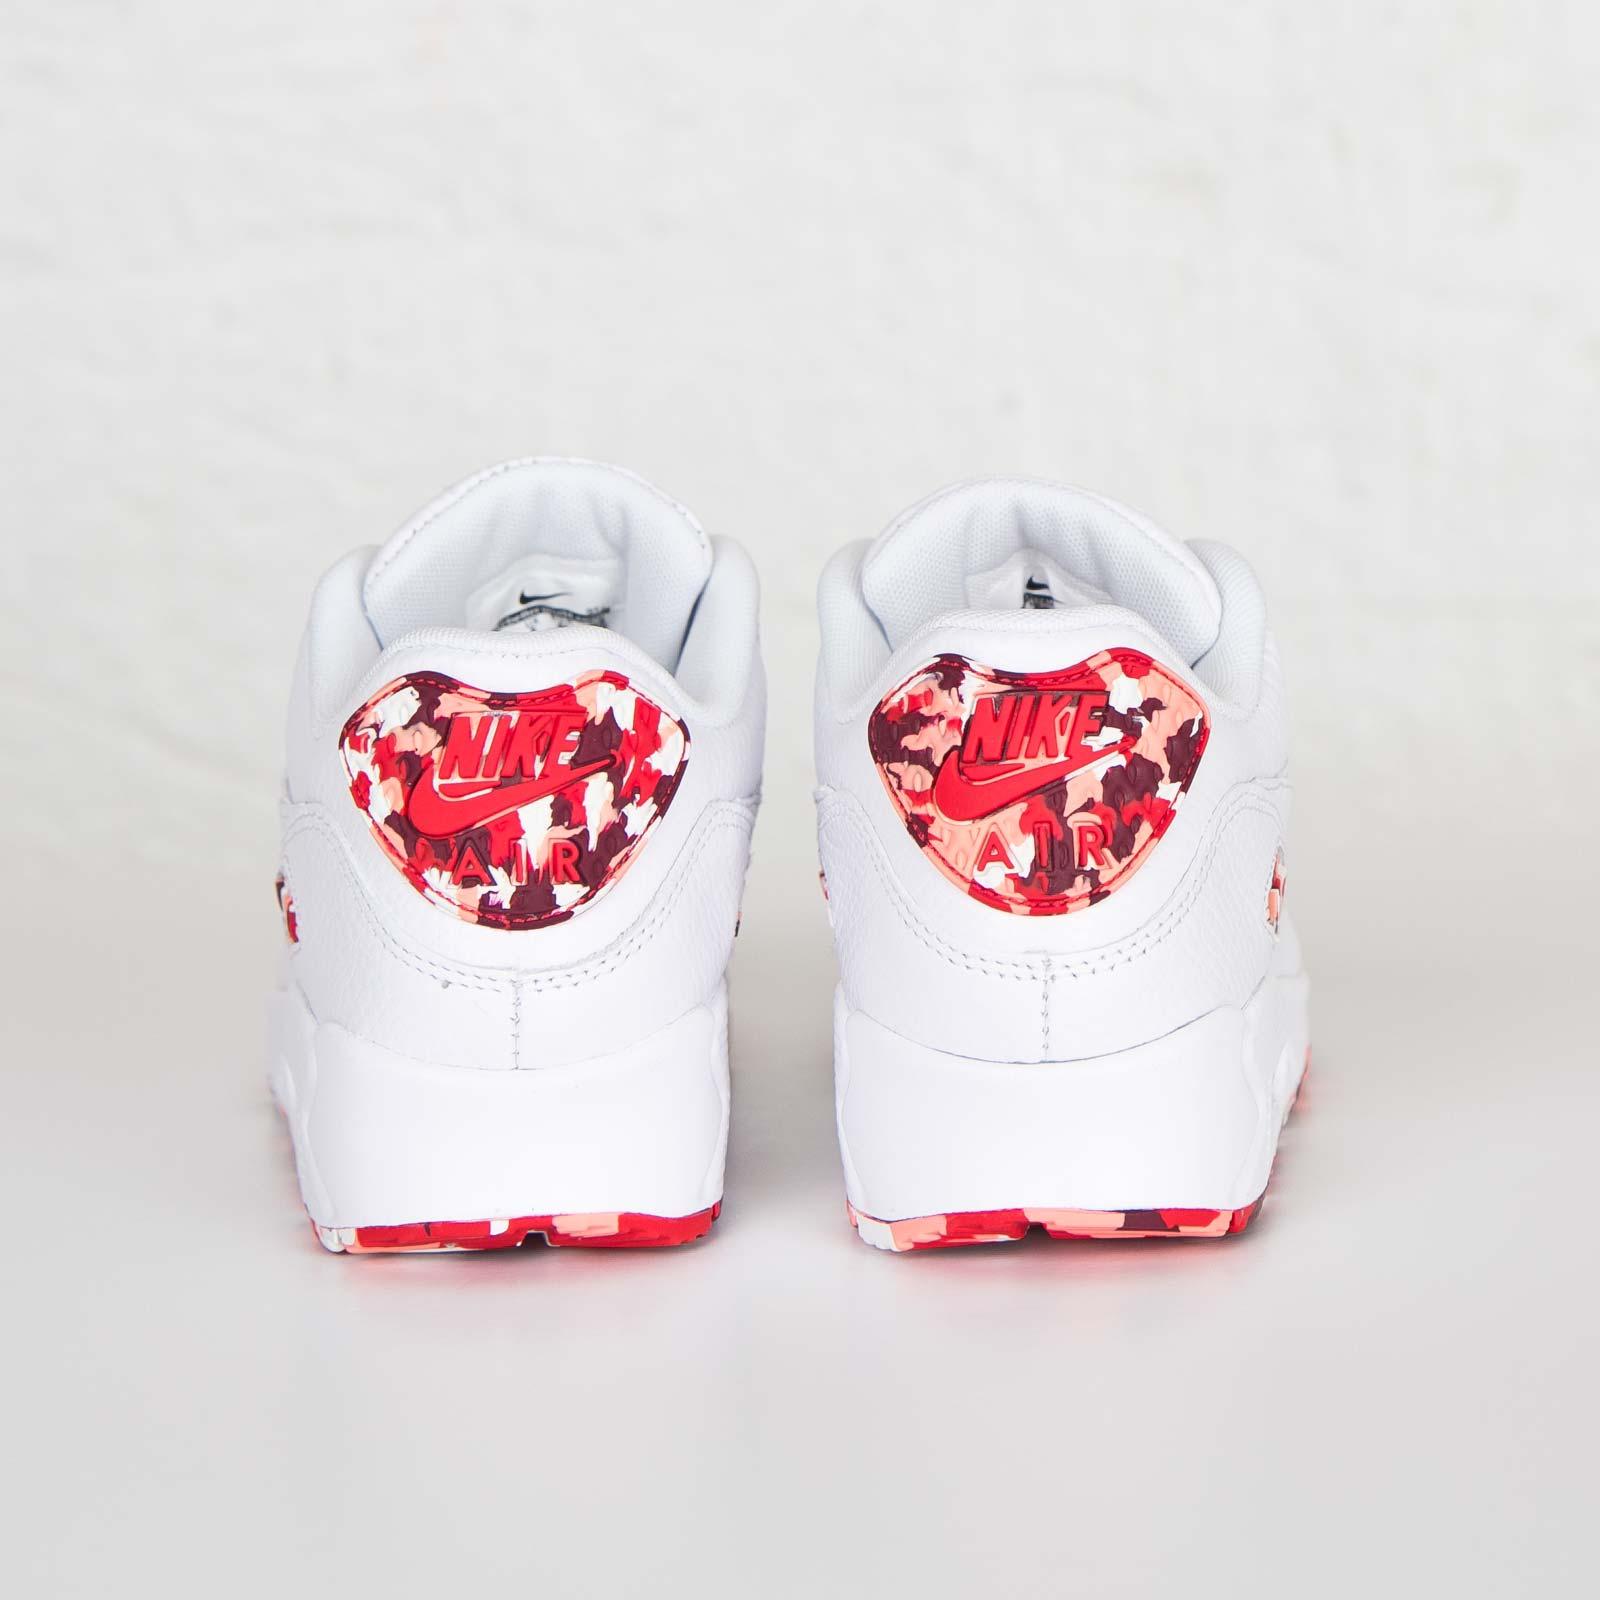 reputable site 4b1ab da1a2 Nike Wmns Air Max 90 QS - 813150-100 - Sneakersnstuff   sneakers    streetwear online since 1999